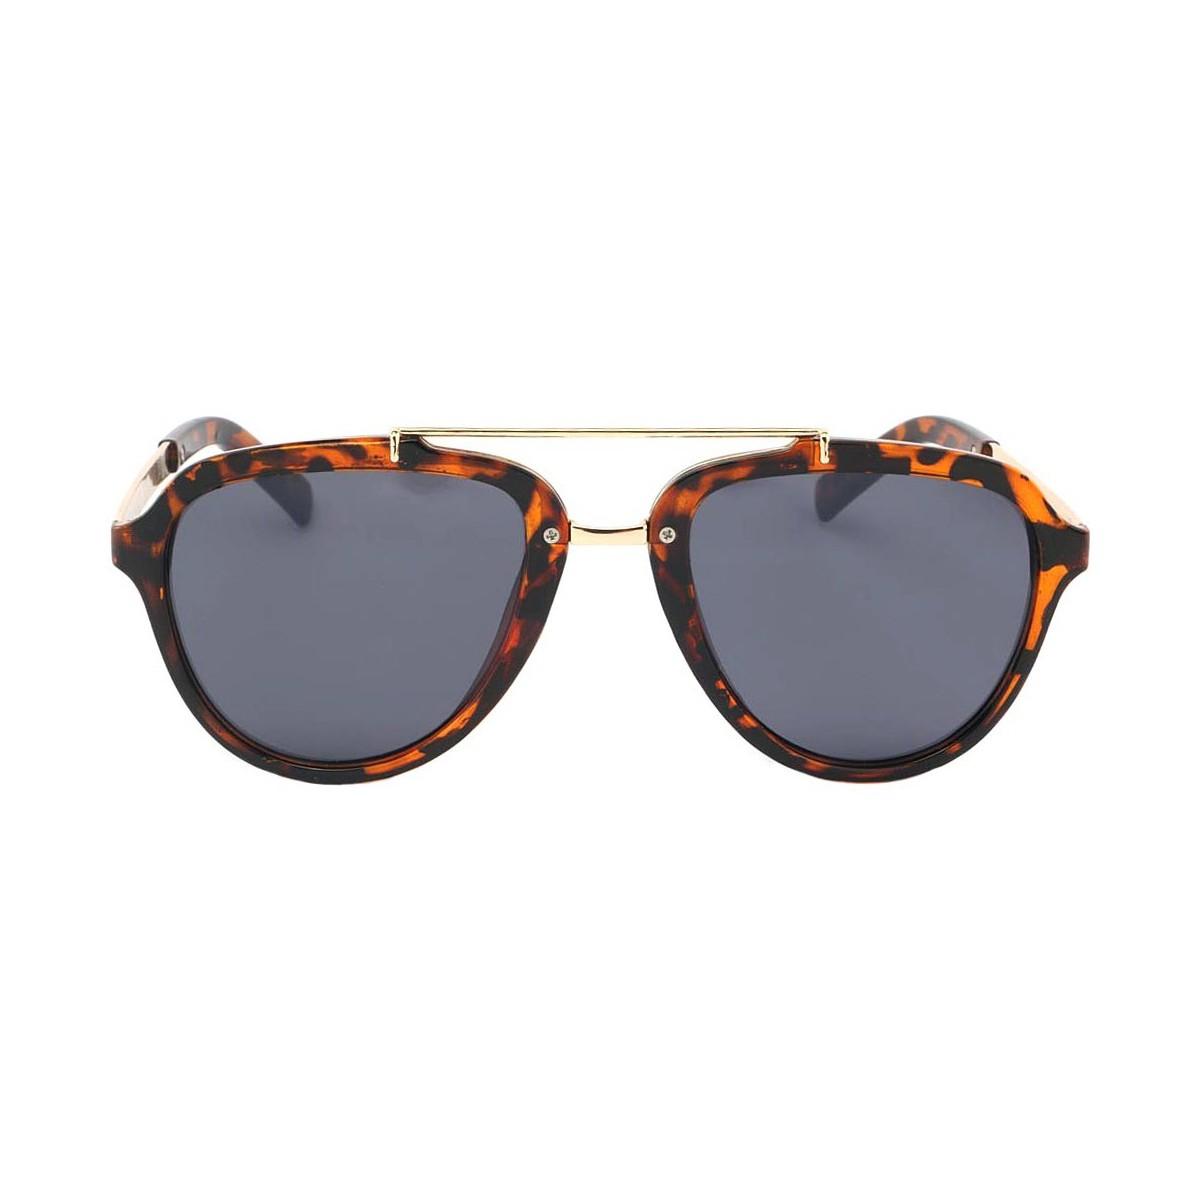 Eye Wear Lunettes de soleil Aviateur Vintage Marron Ponza Marron